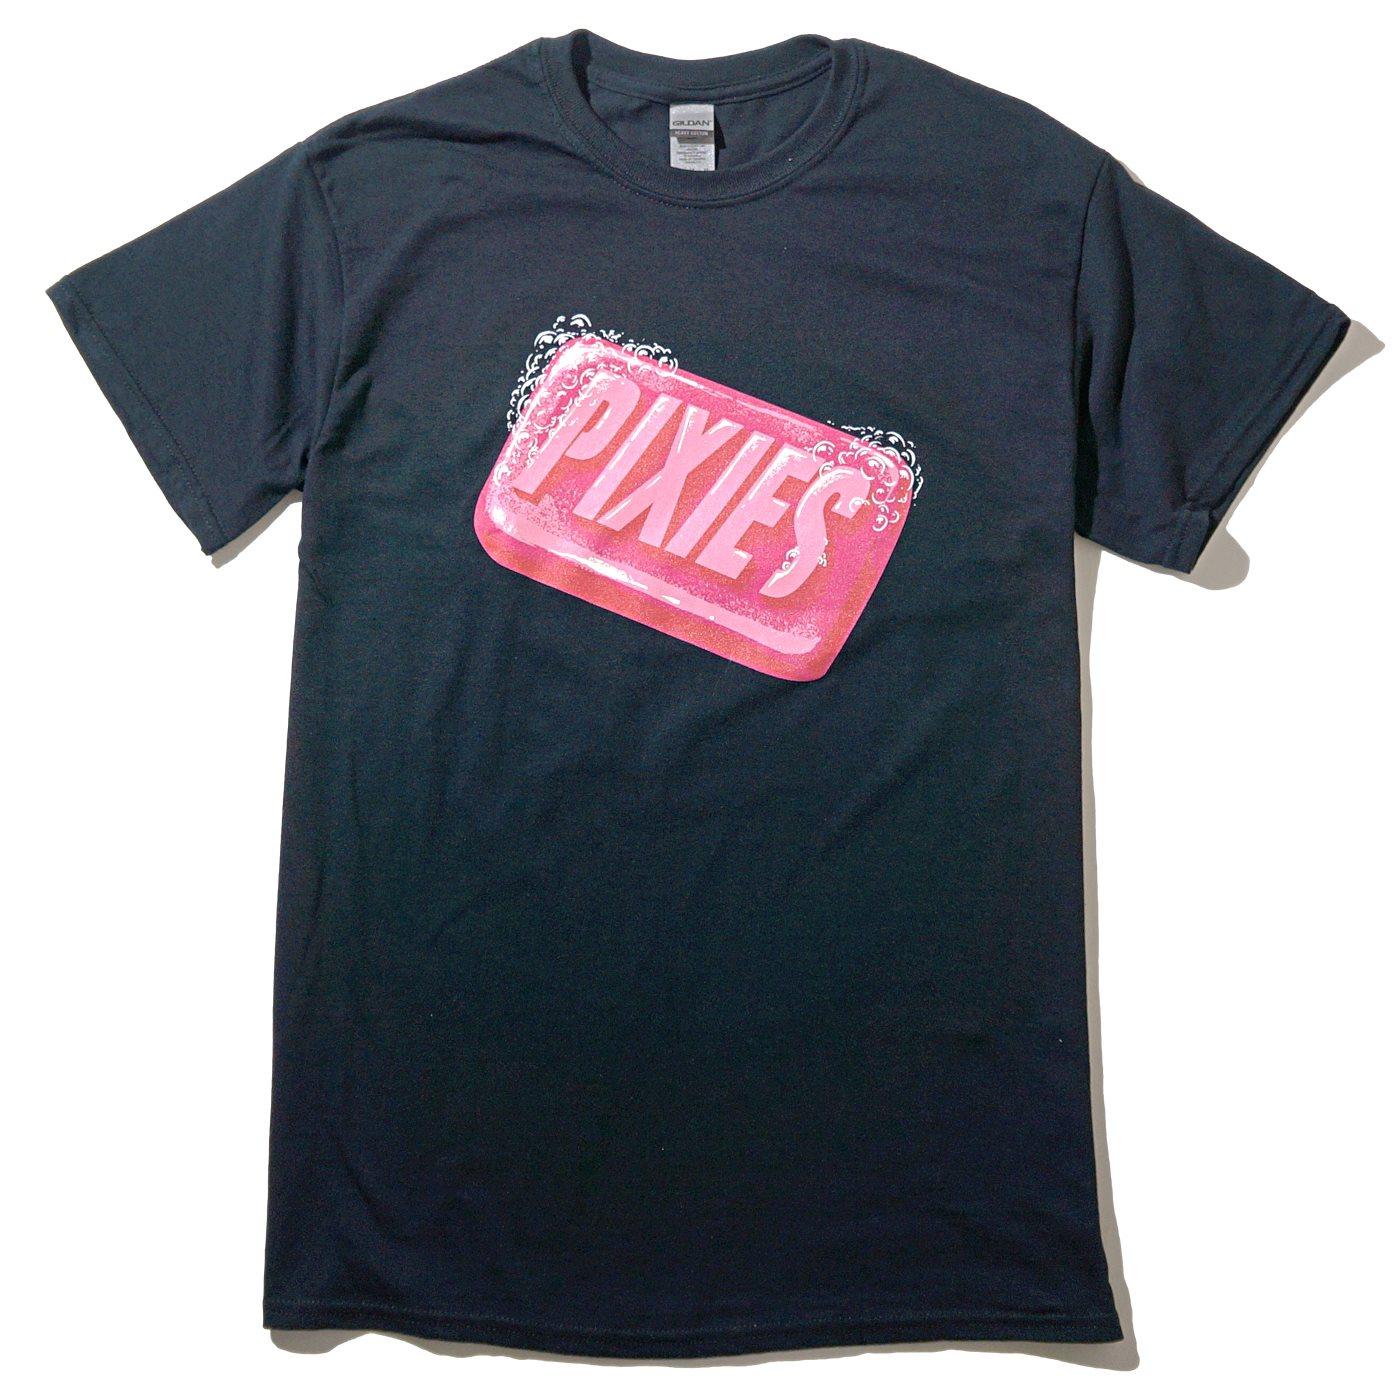 PIXIES Tシャツ Wash Up